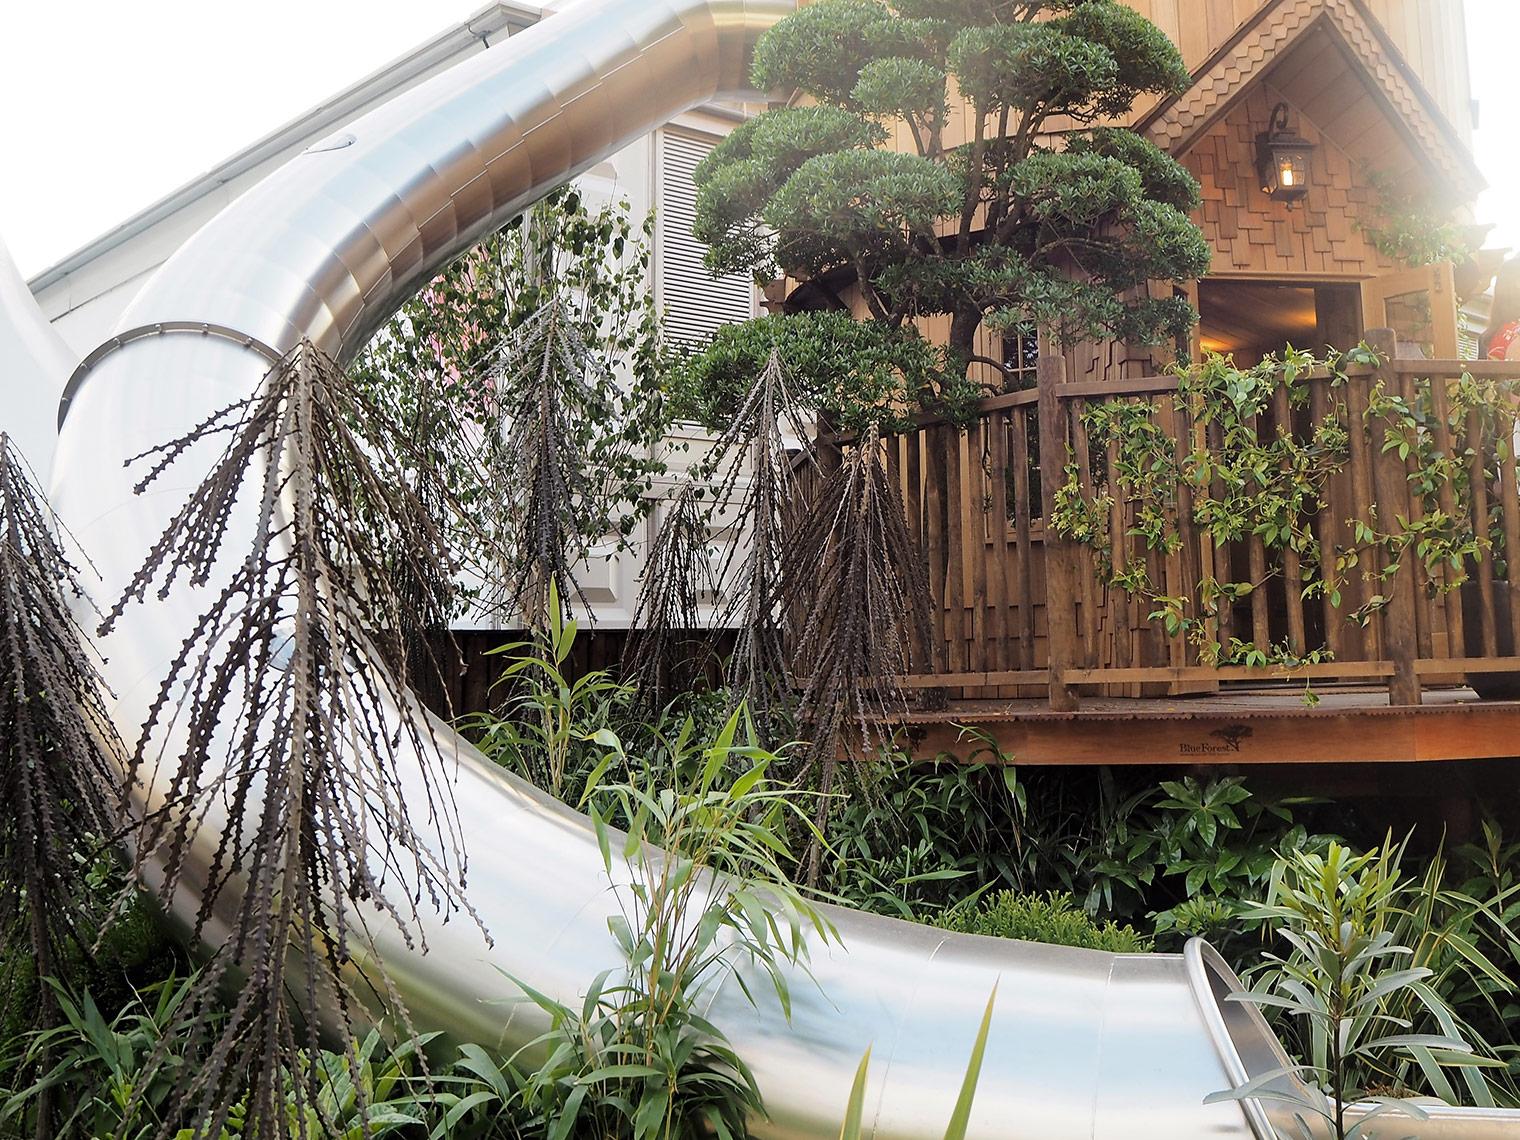 Garden display at Chelsea flower show 2018